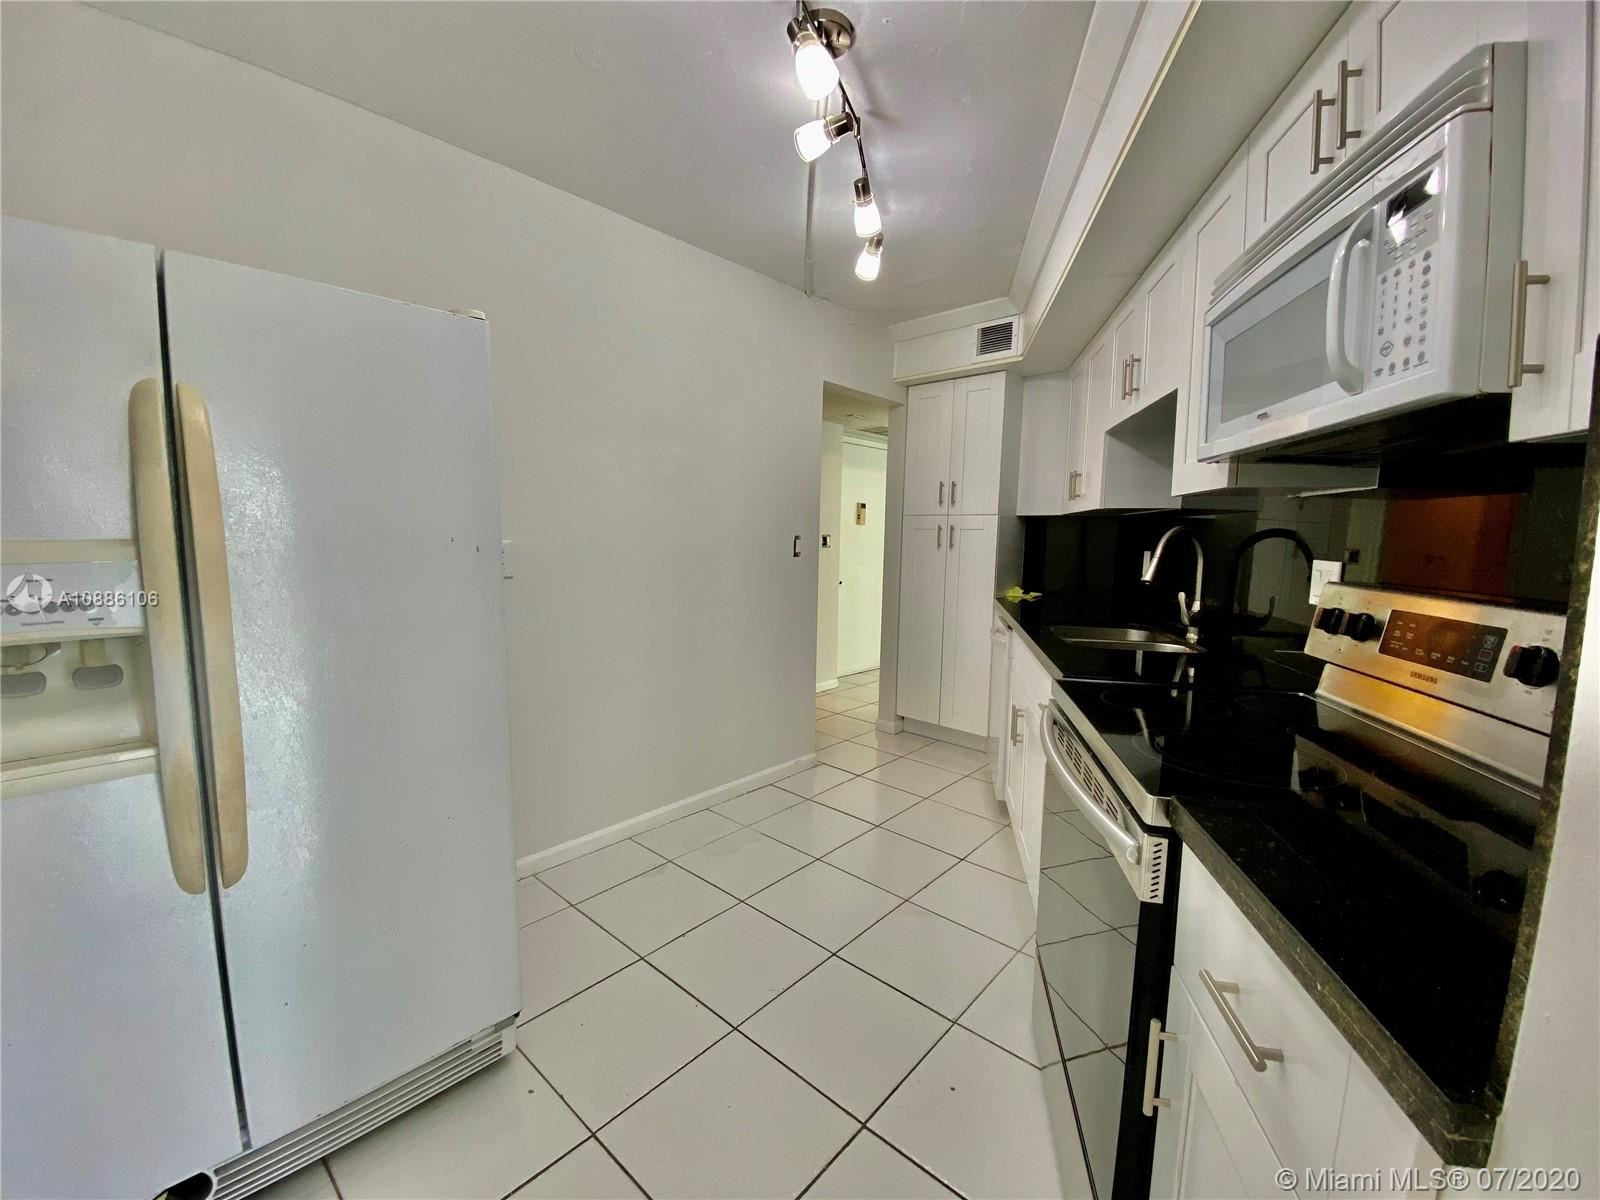 Photo of 6921 Environ Blvd #2P, Lauderhill, FL 33319 (MLS # A10886106)